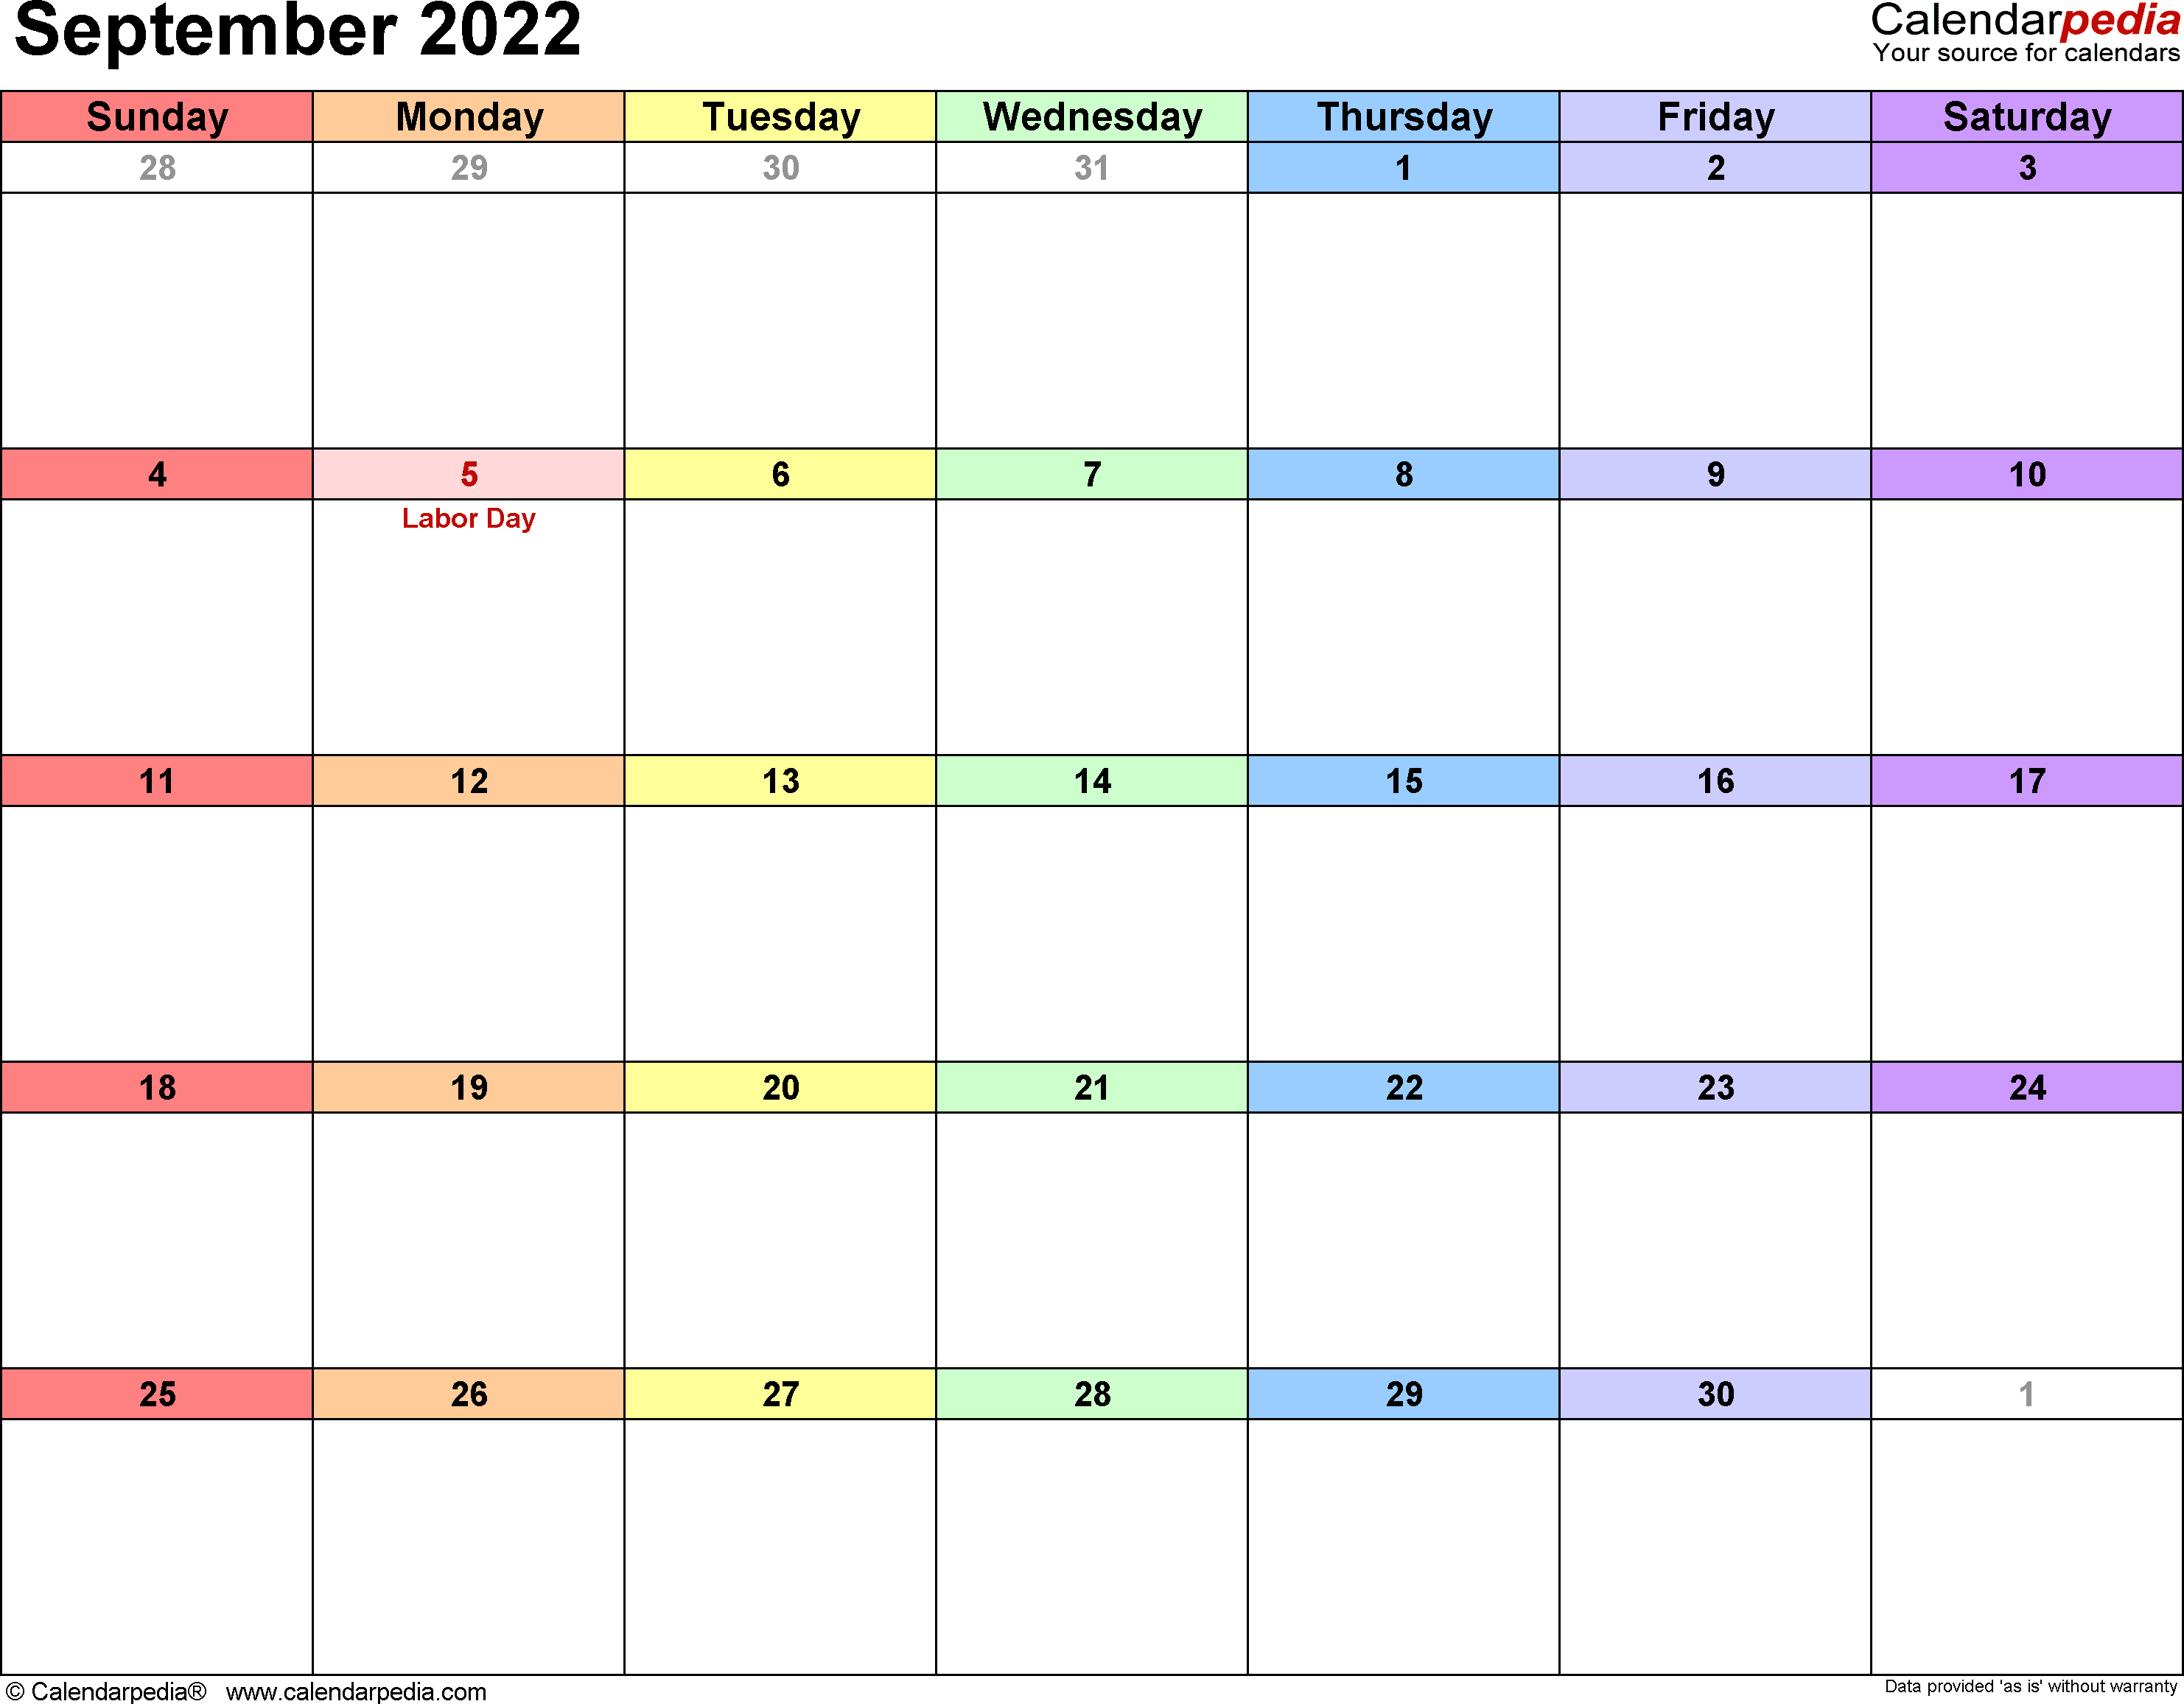 September 2022 Calendars for Word, Excel & PDF